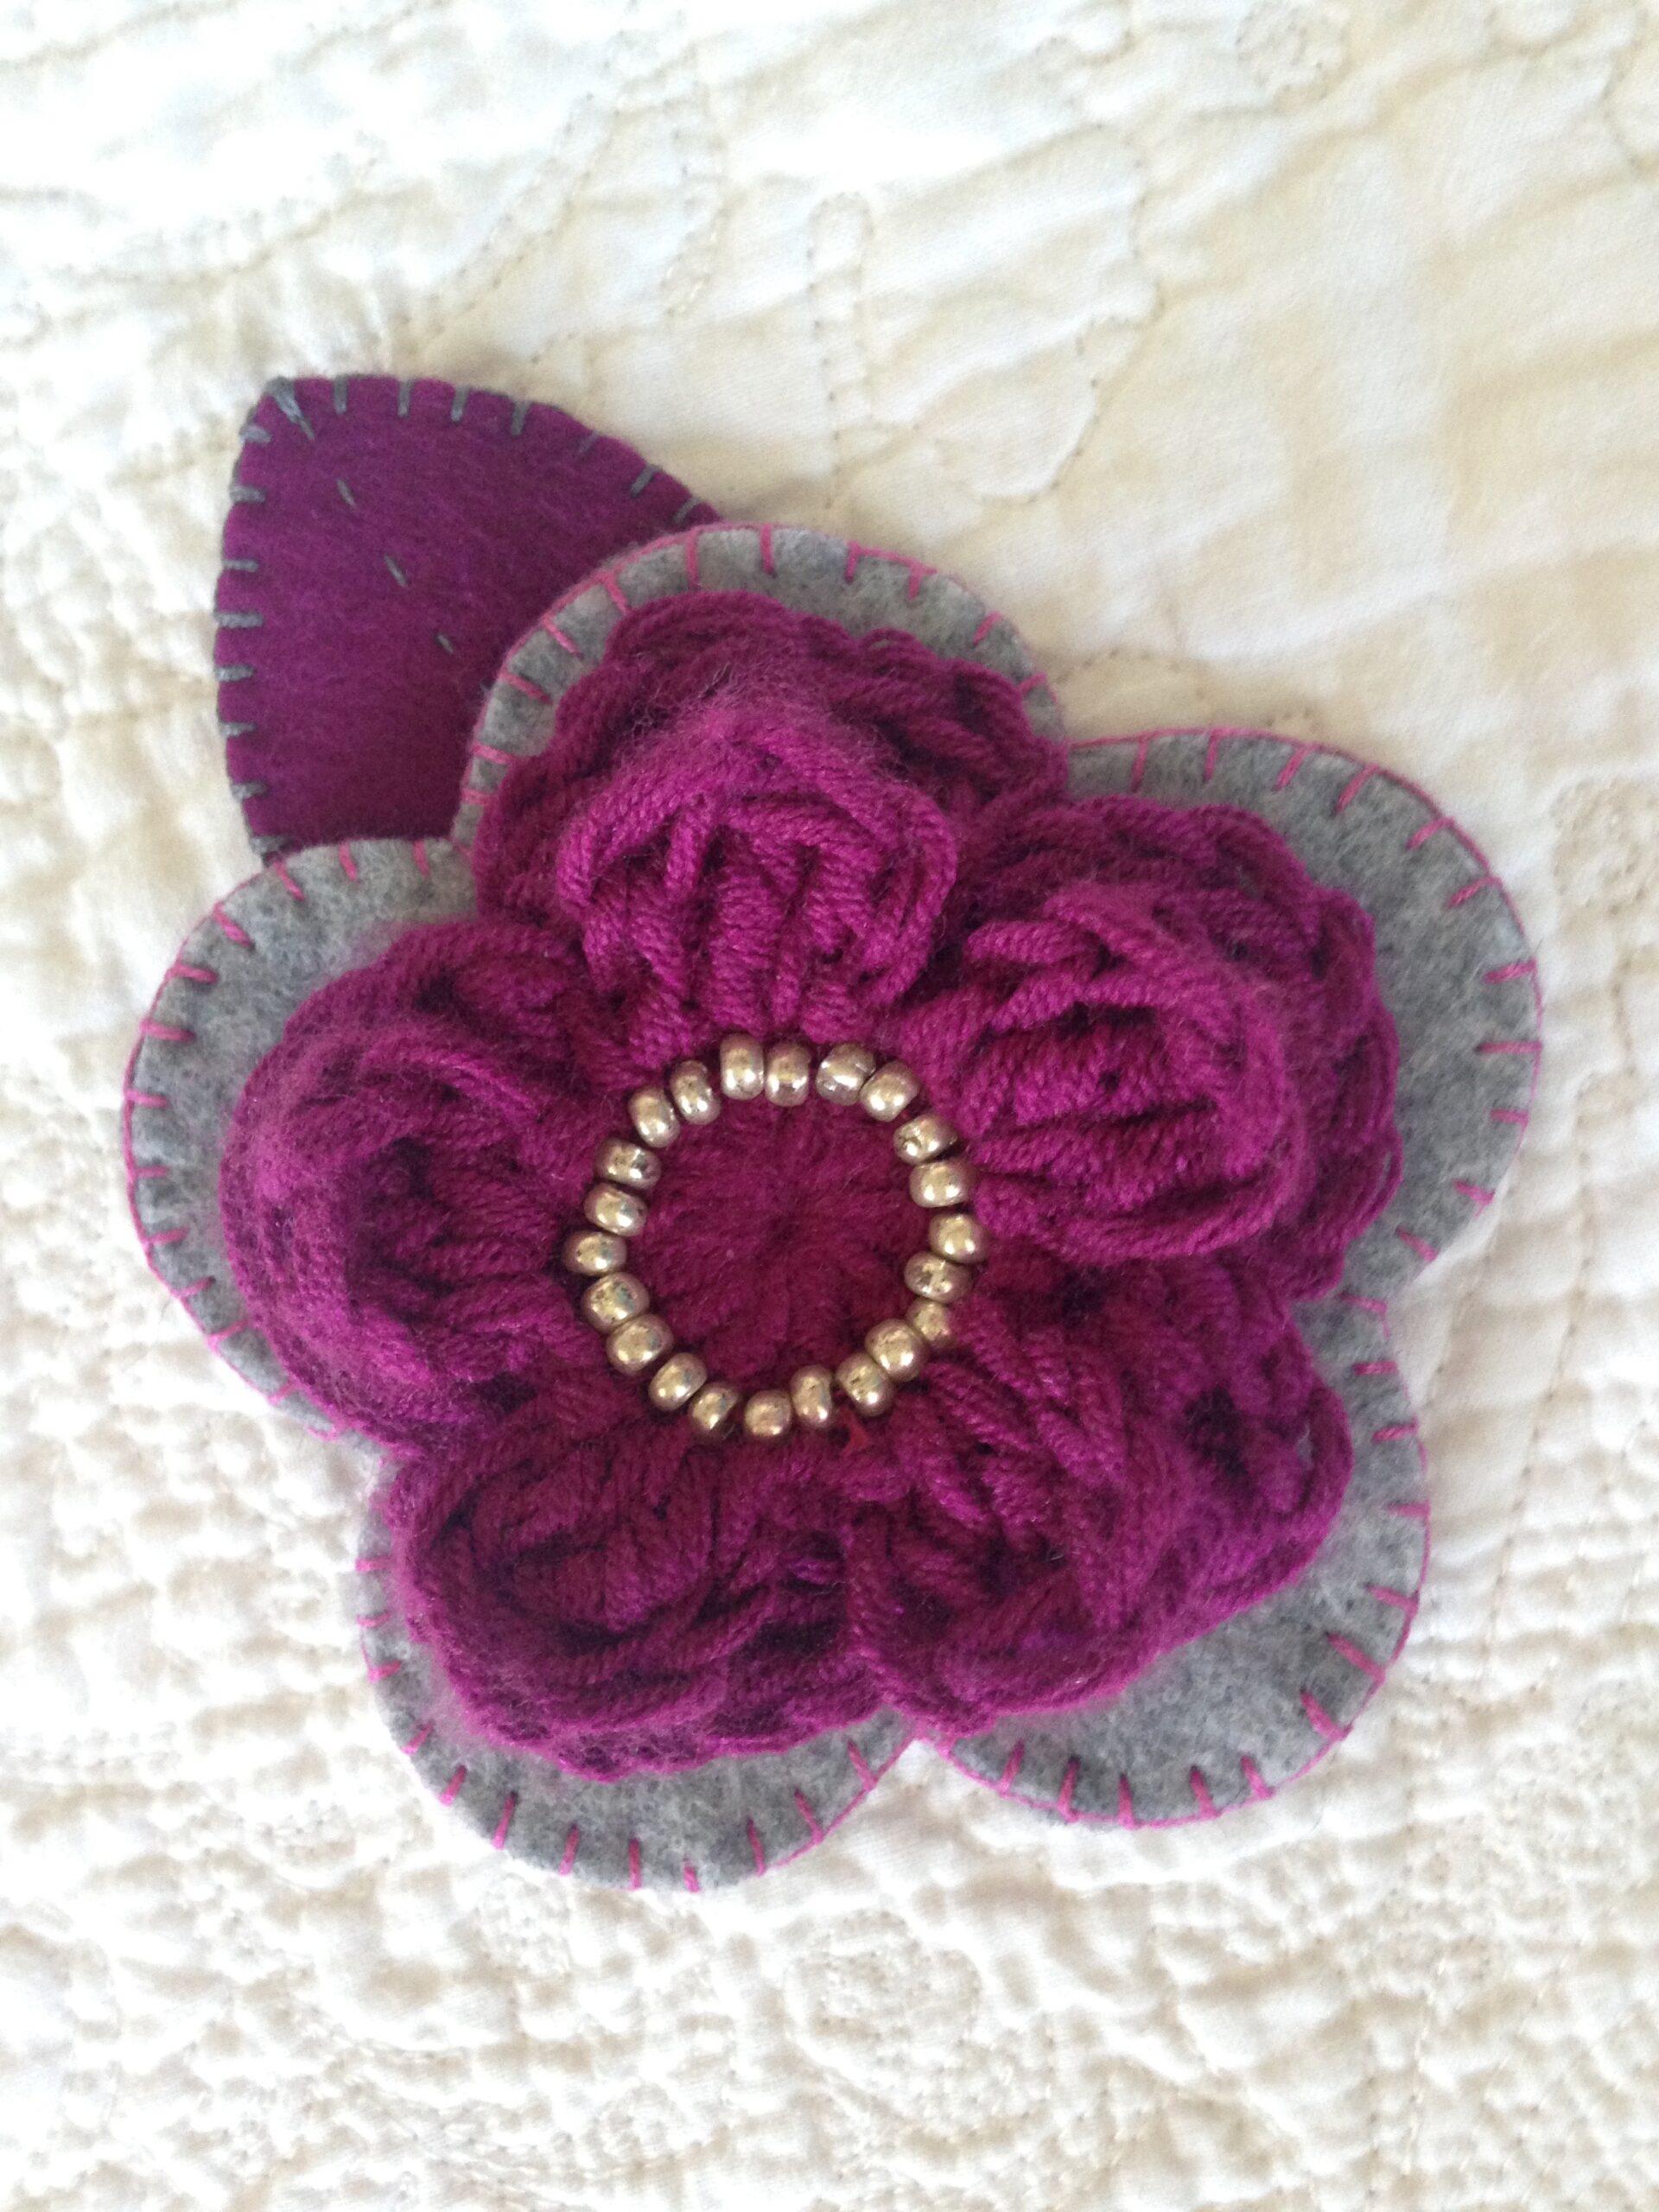 Hand sewn felt and beaded crocheted flower brooch.